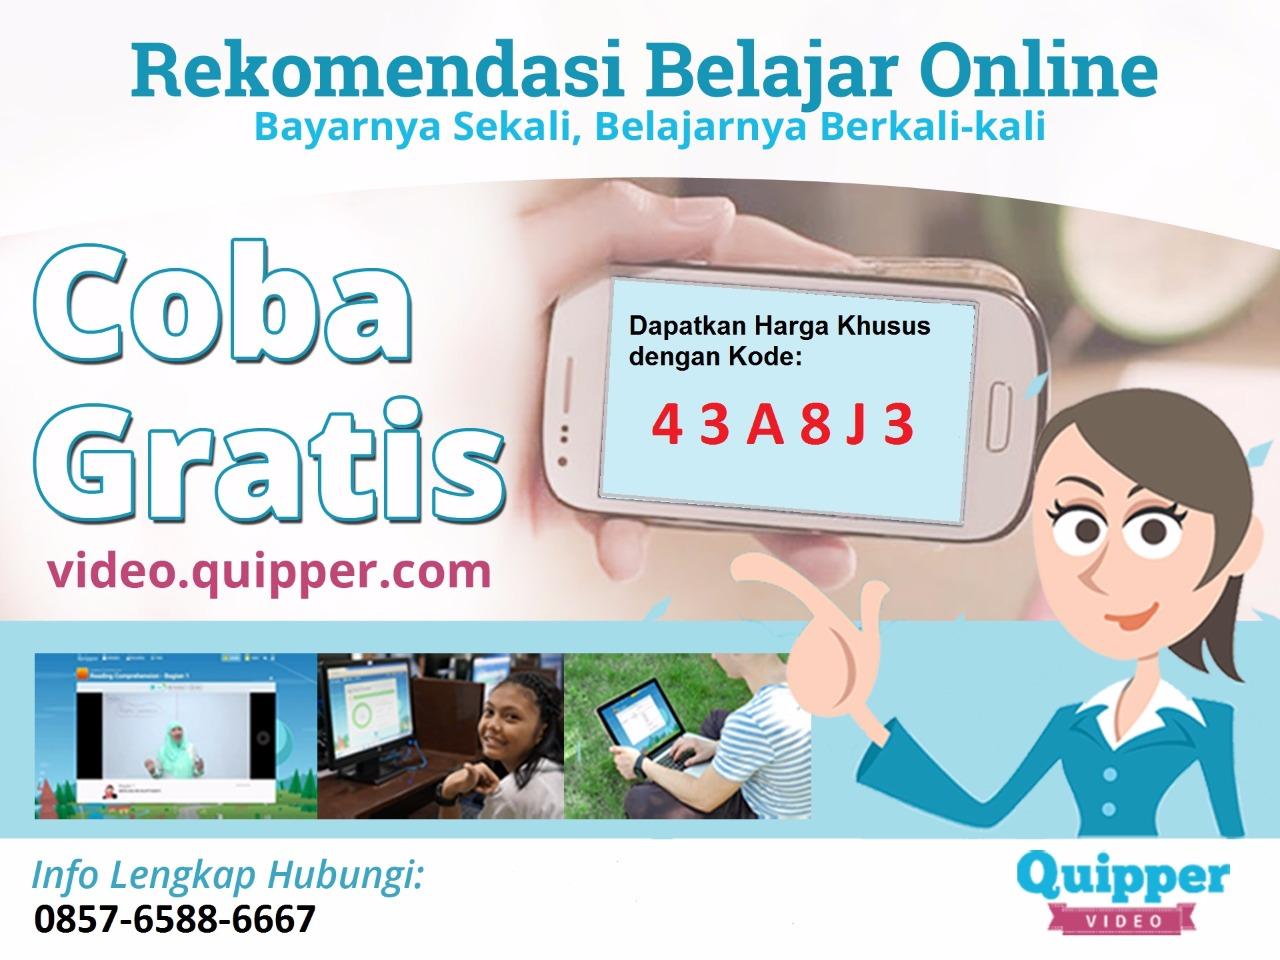 Kode Promo Quipper Video 2018 2017 43a8j3 Sbmptn Untuk Promonya Yaitu